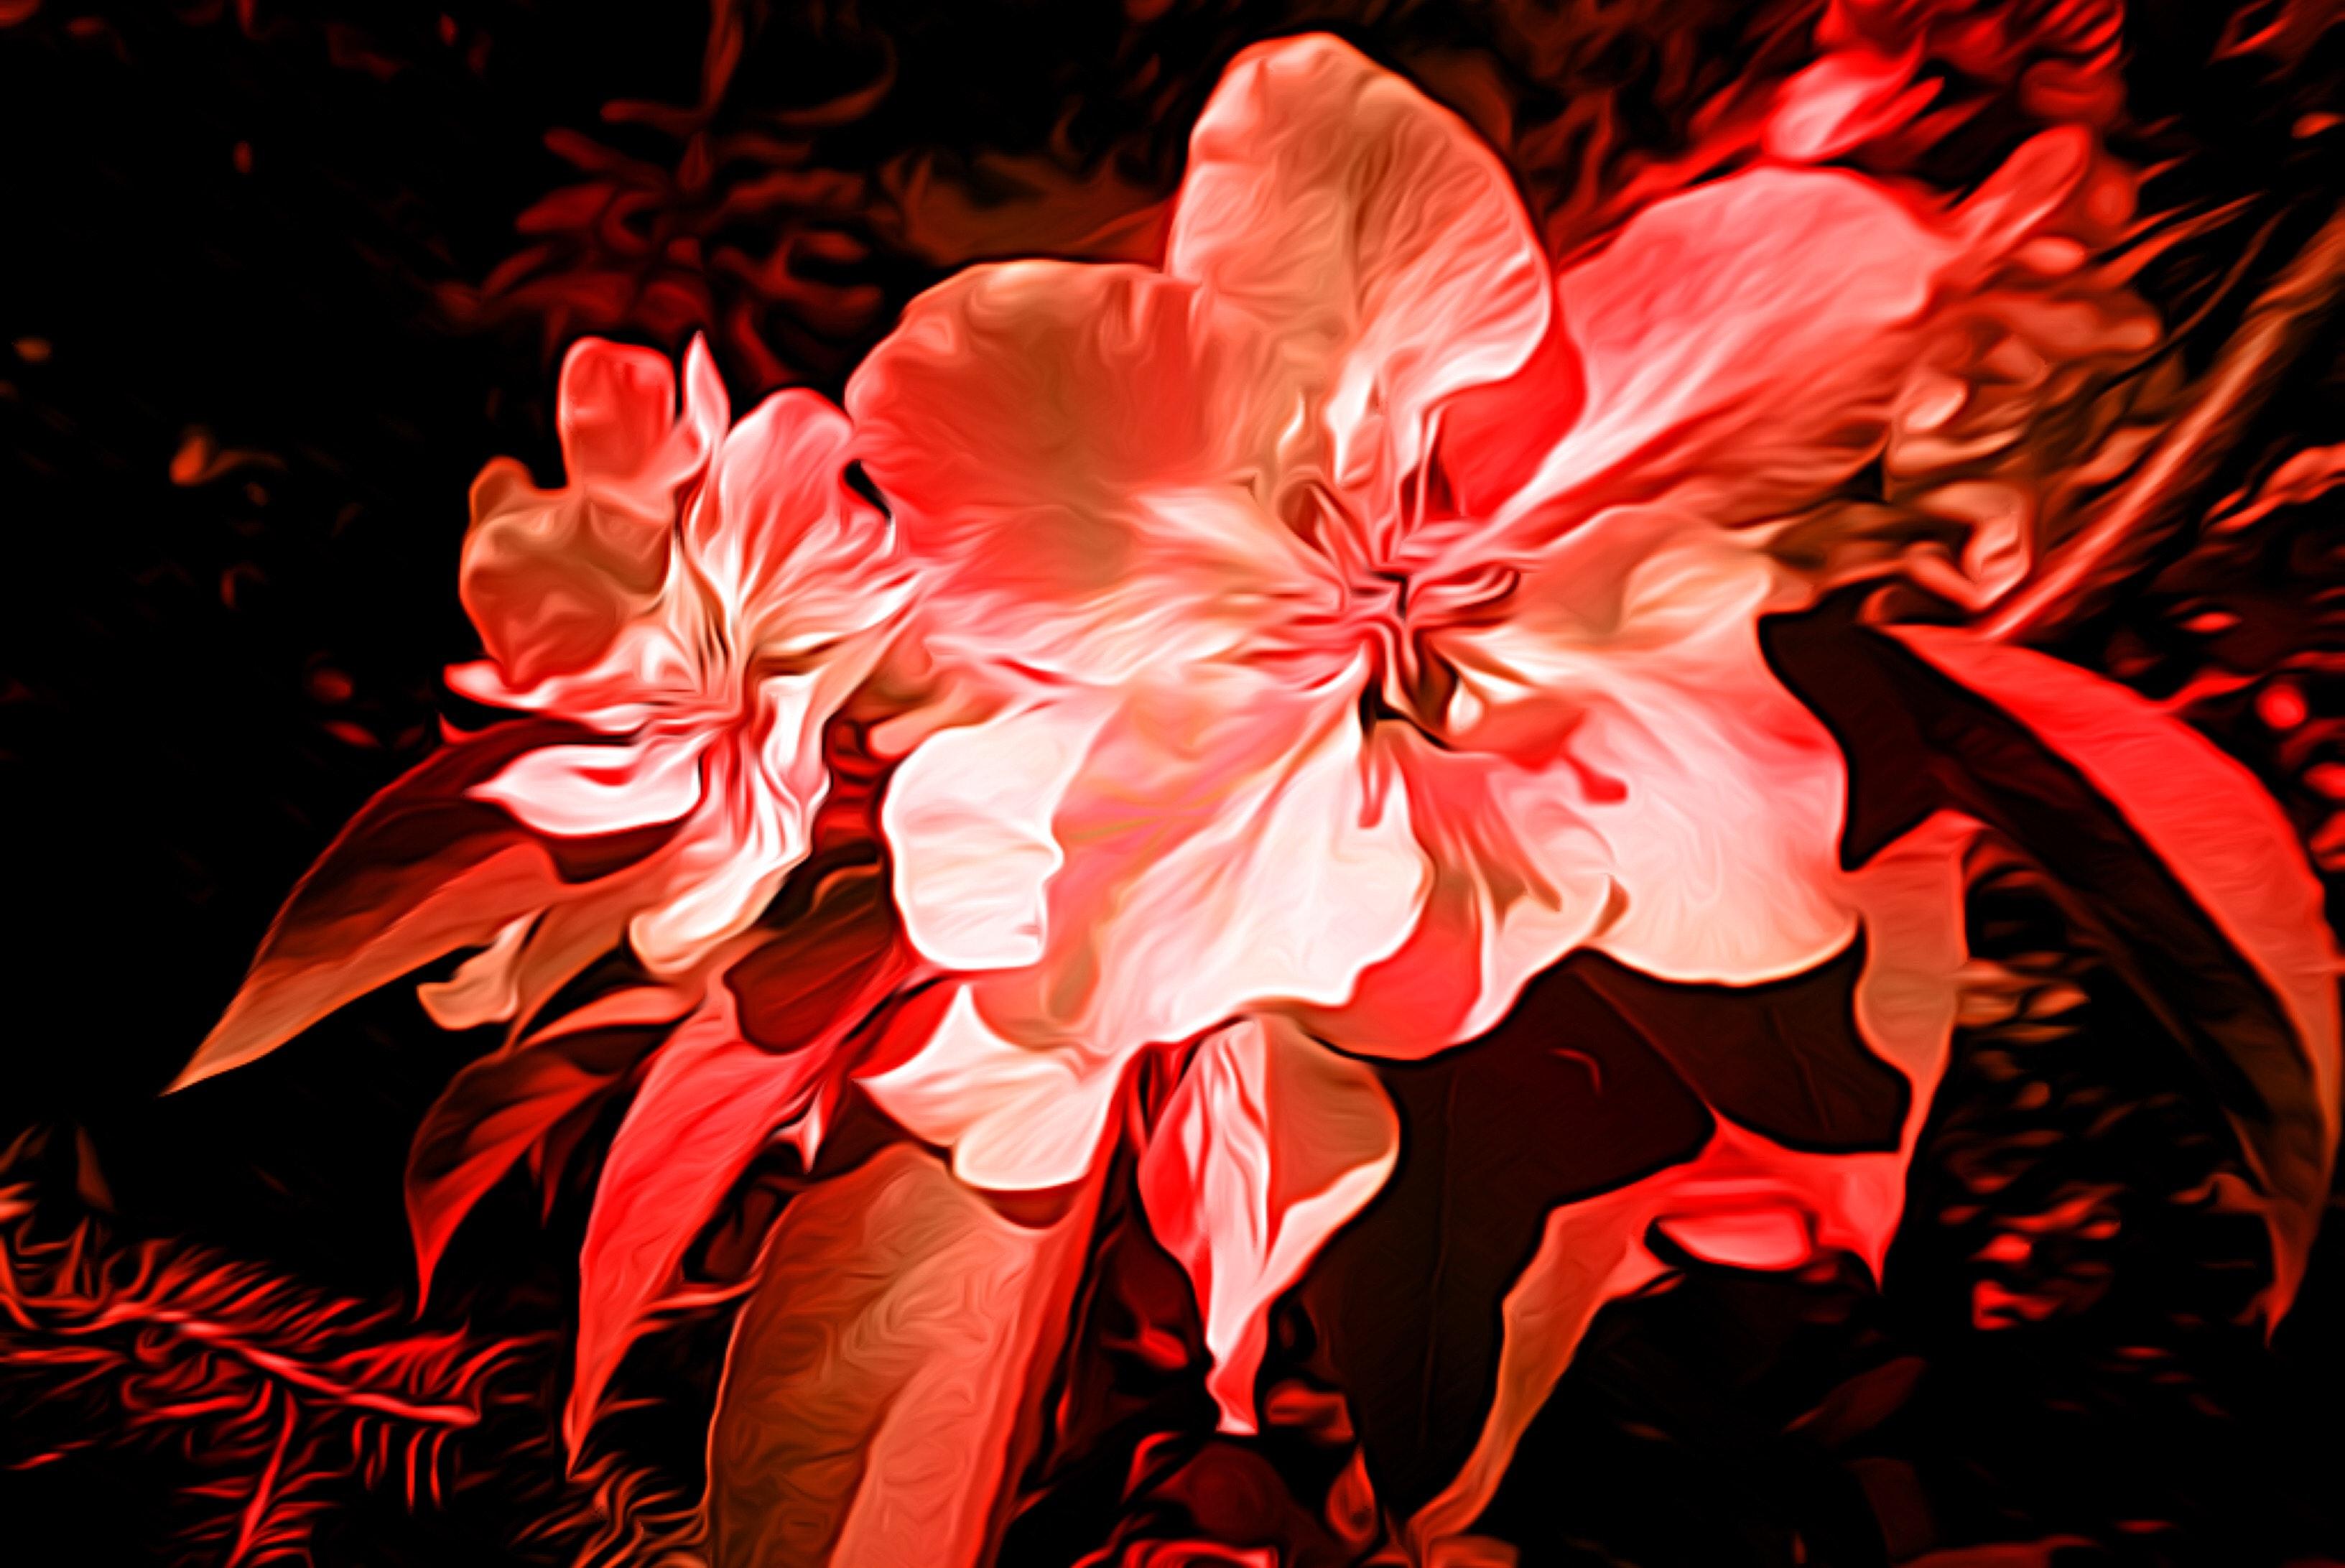 Free stock photo of art, Flowers art.